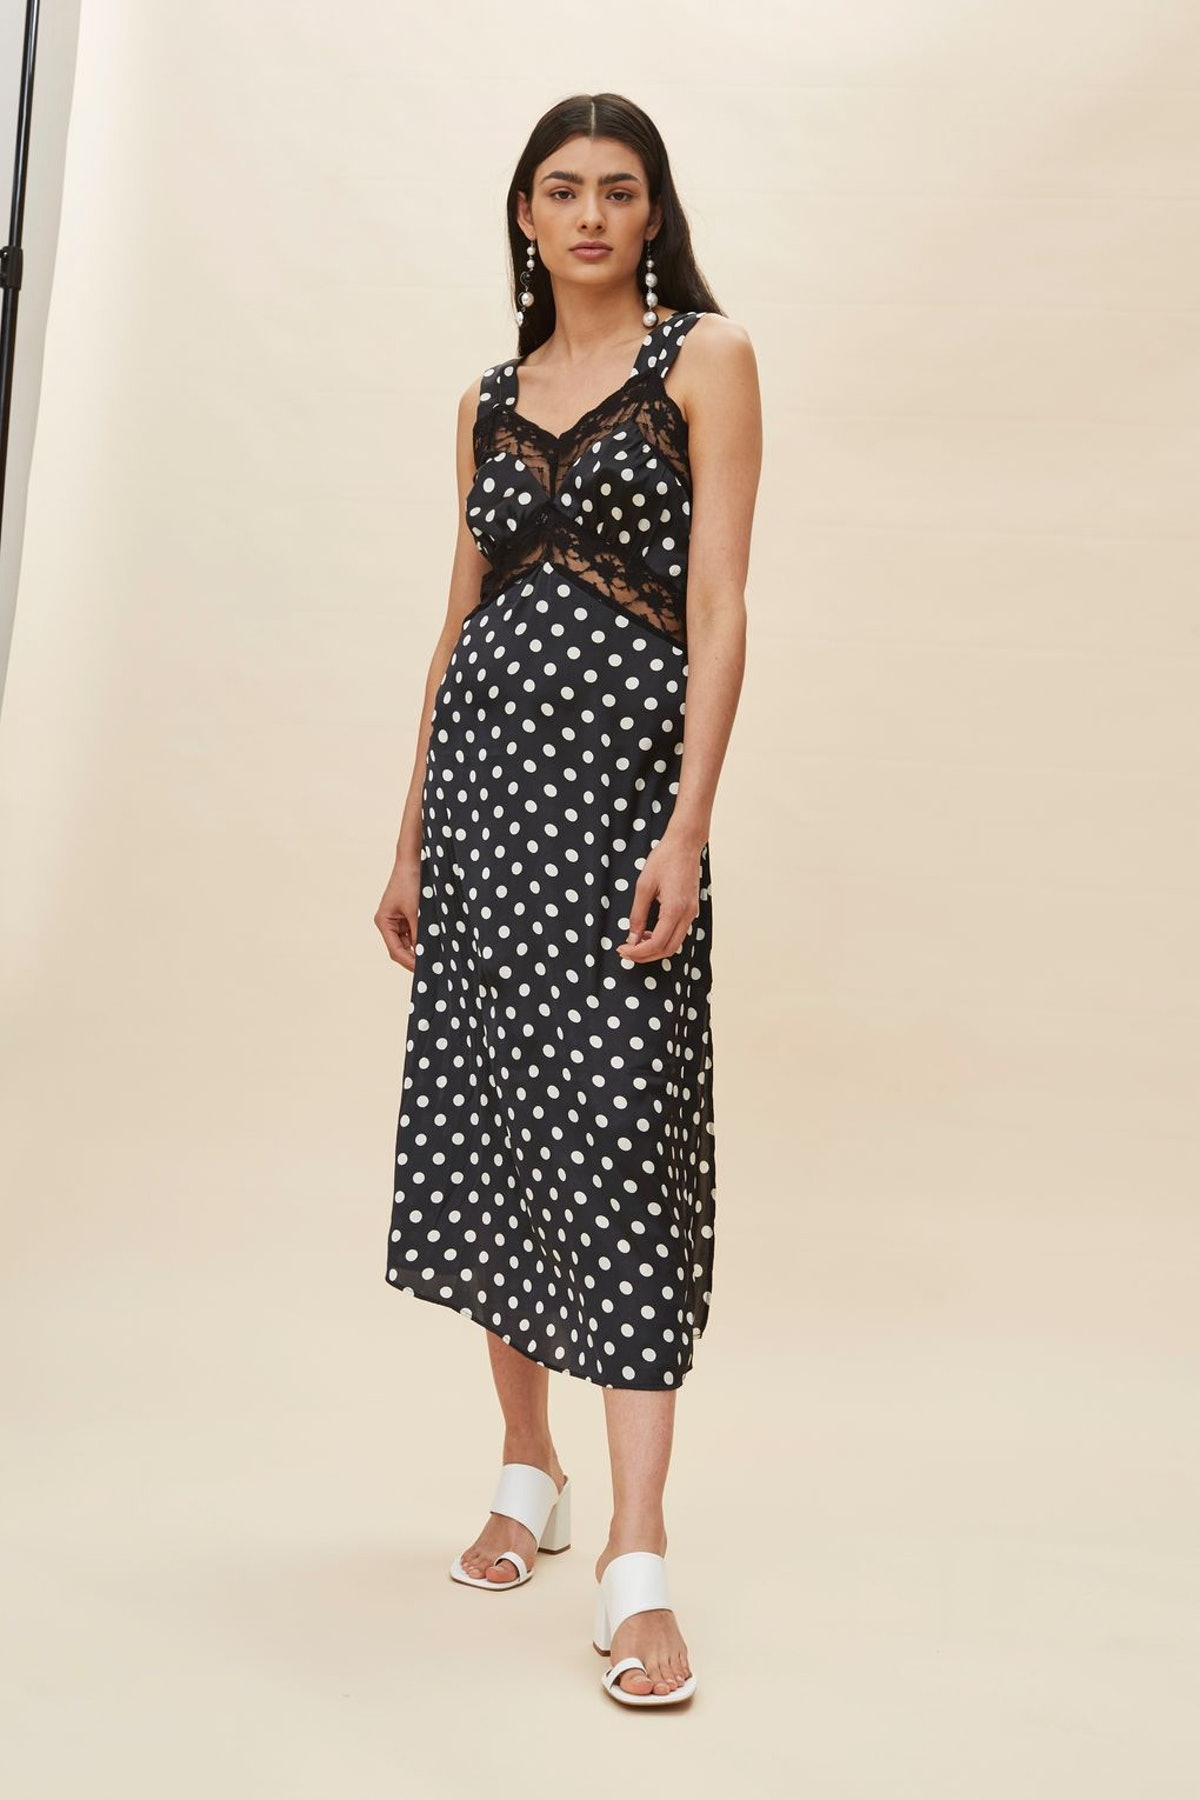 Polka Dot Lace Satin Slip Dress